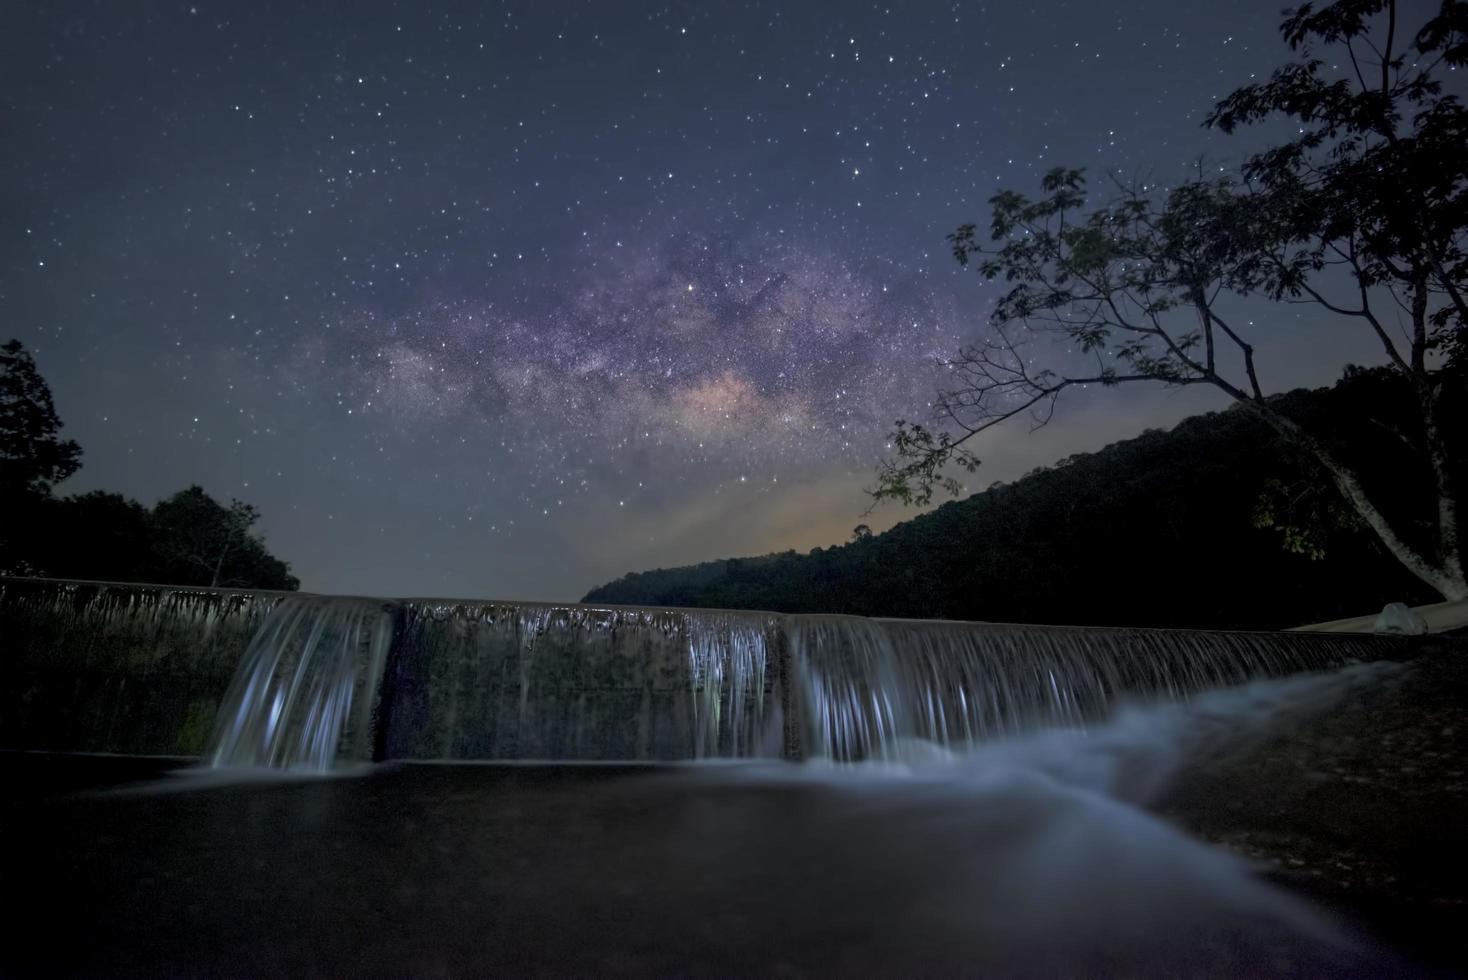 Milky Way over small dam photo